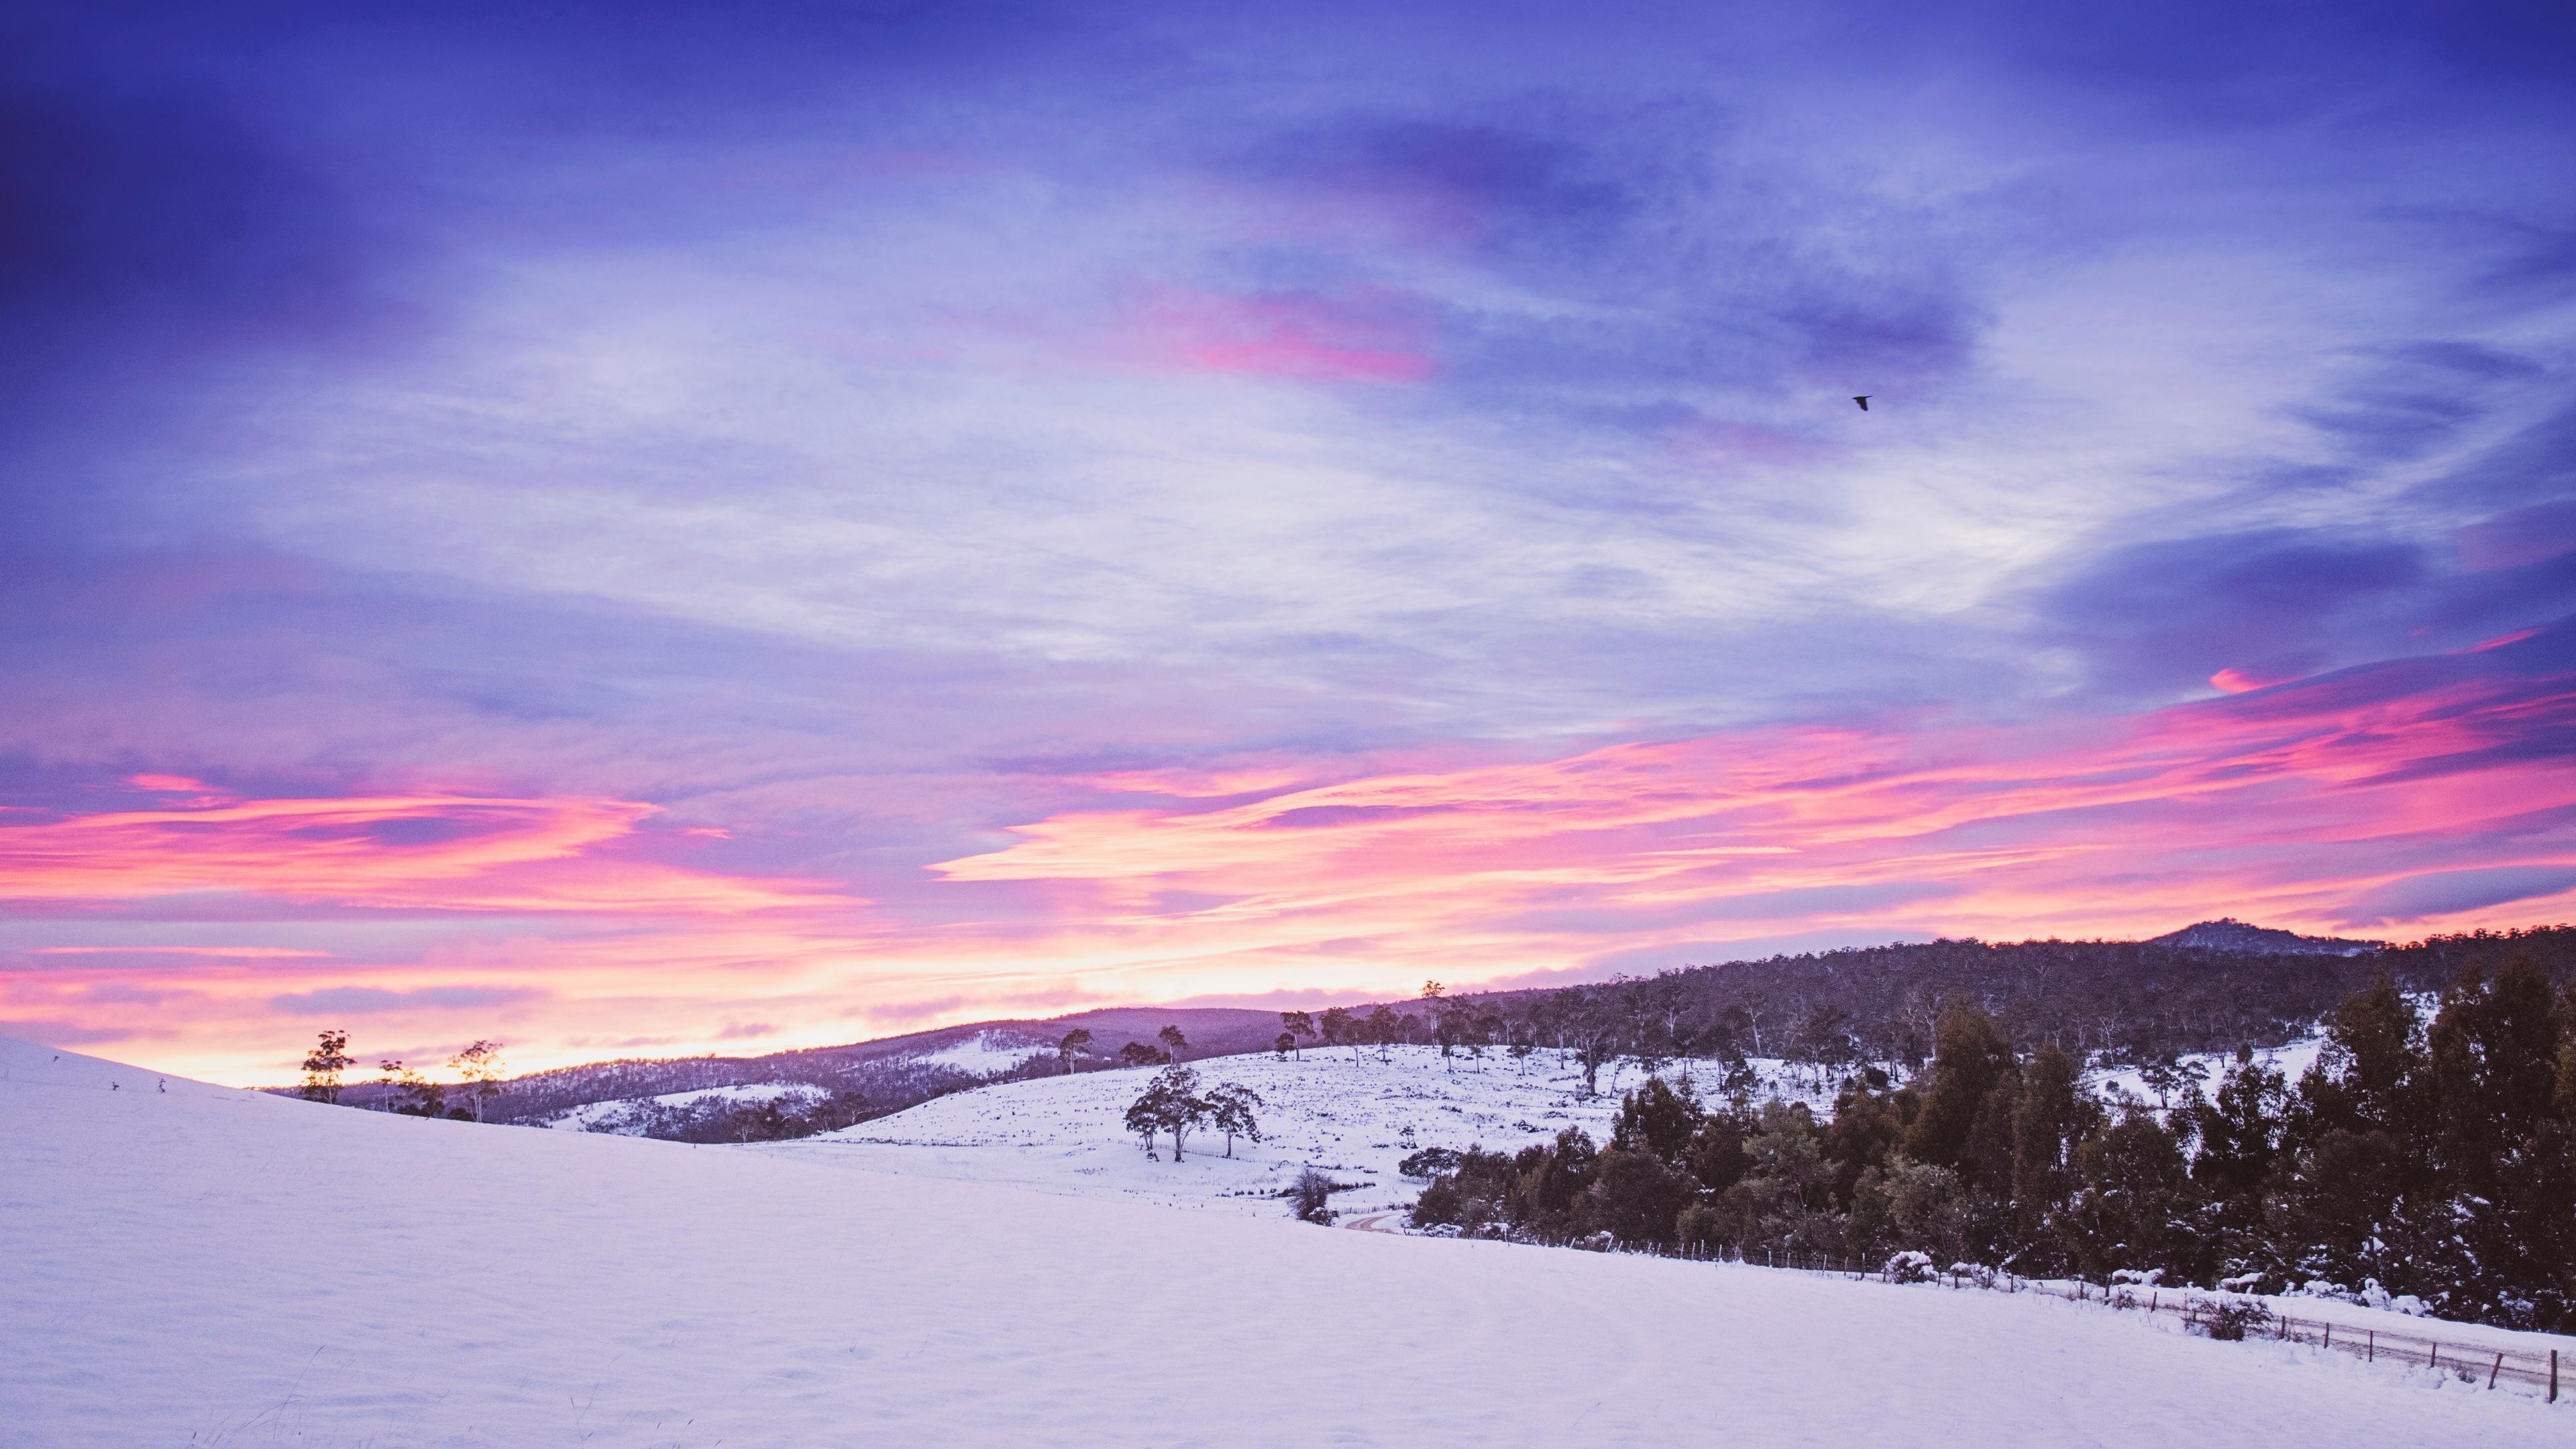 Snowy Mountains Landscape 4k